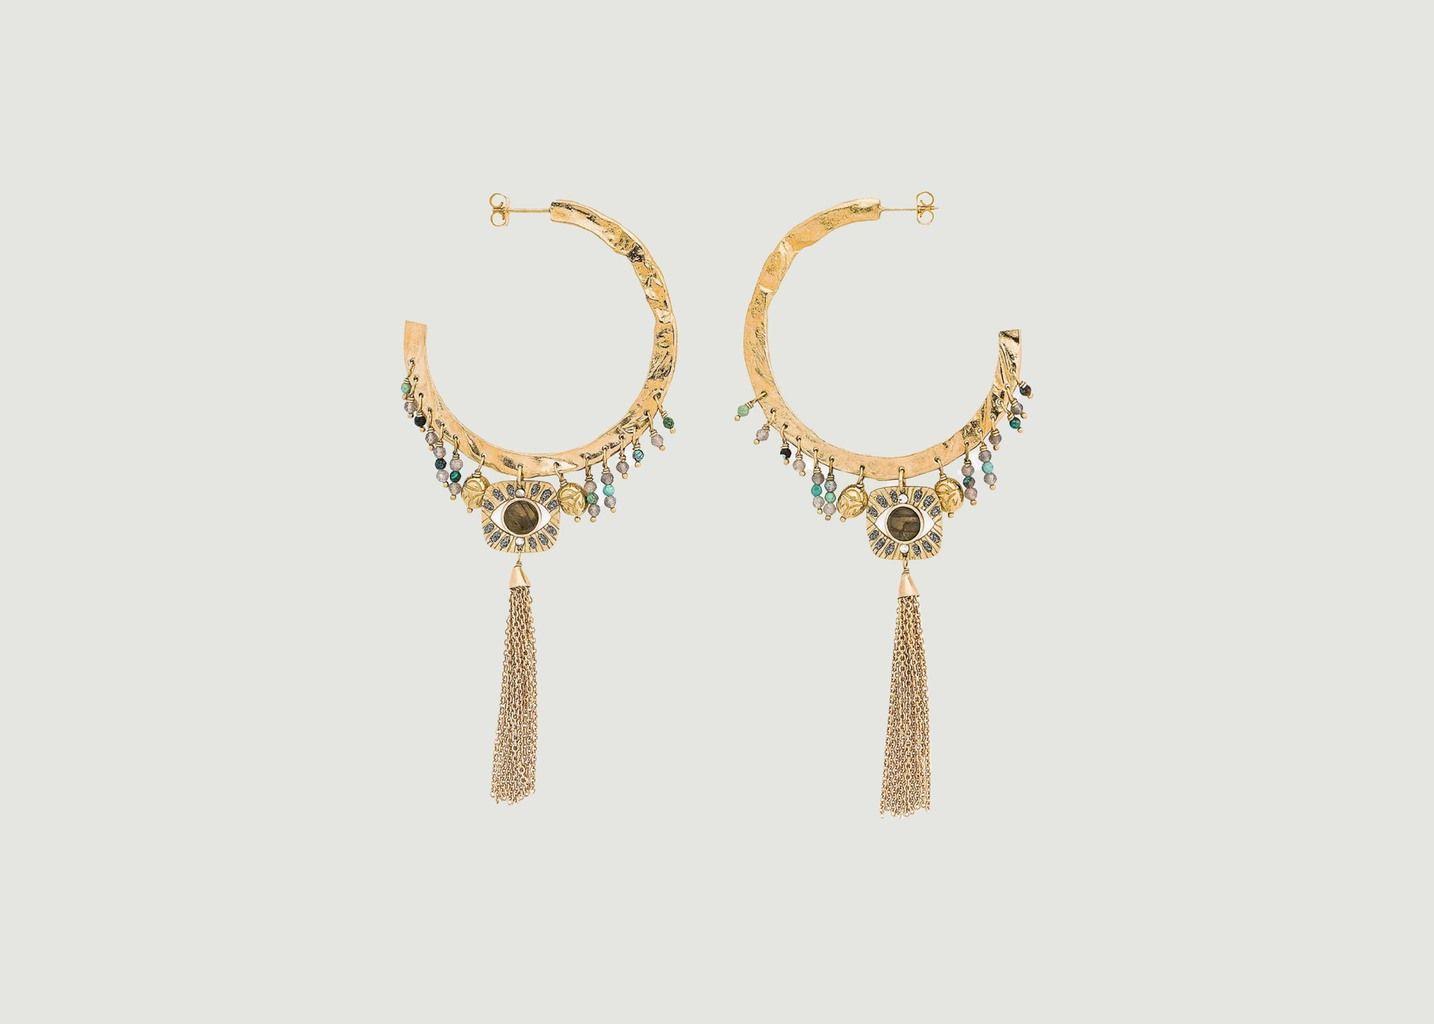 Boucles d'oreilles Cloé - Hipanema